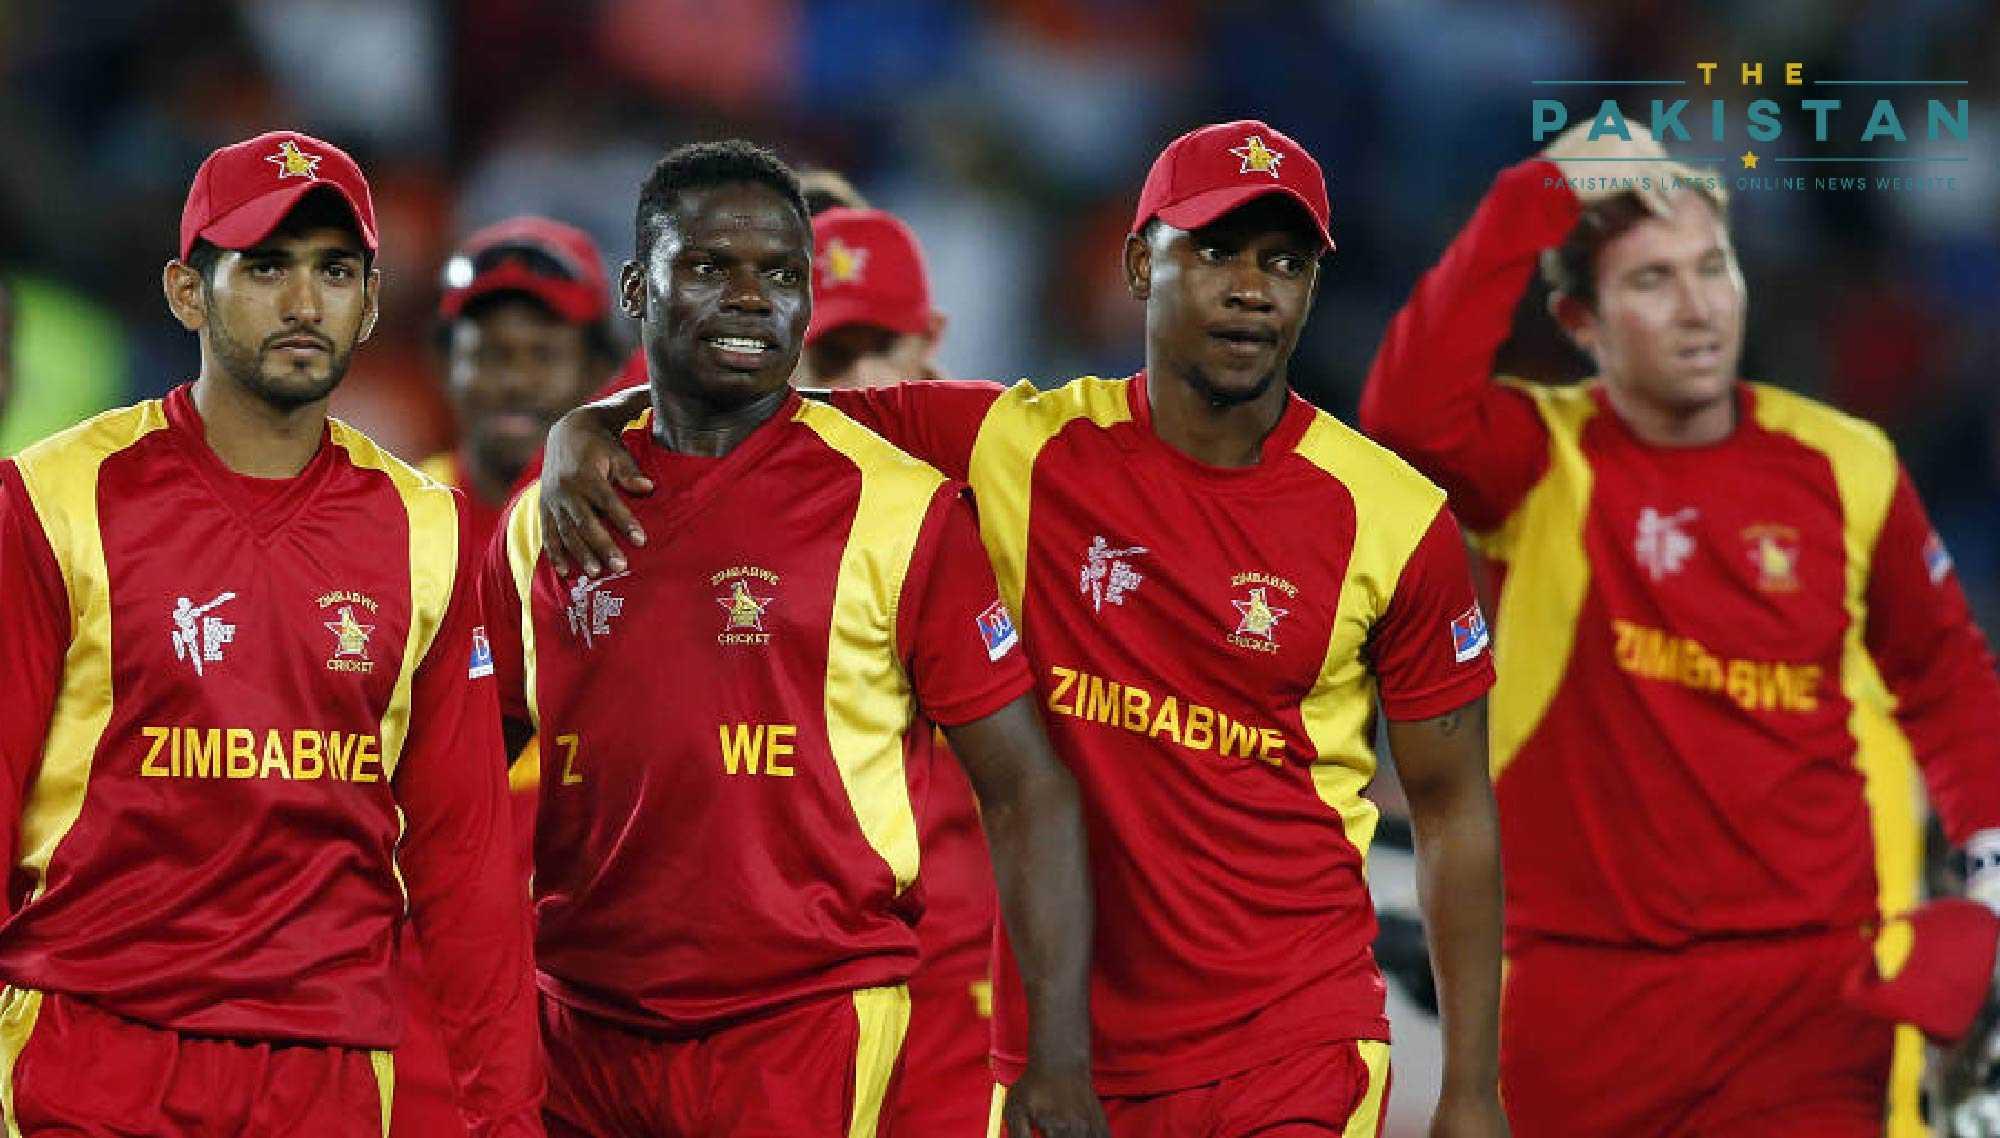 PCB moves Zimbabwe series to Rawalpindi and Karachi